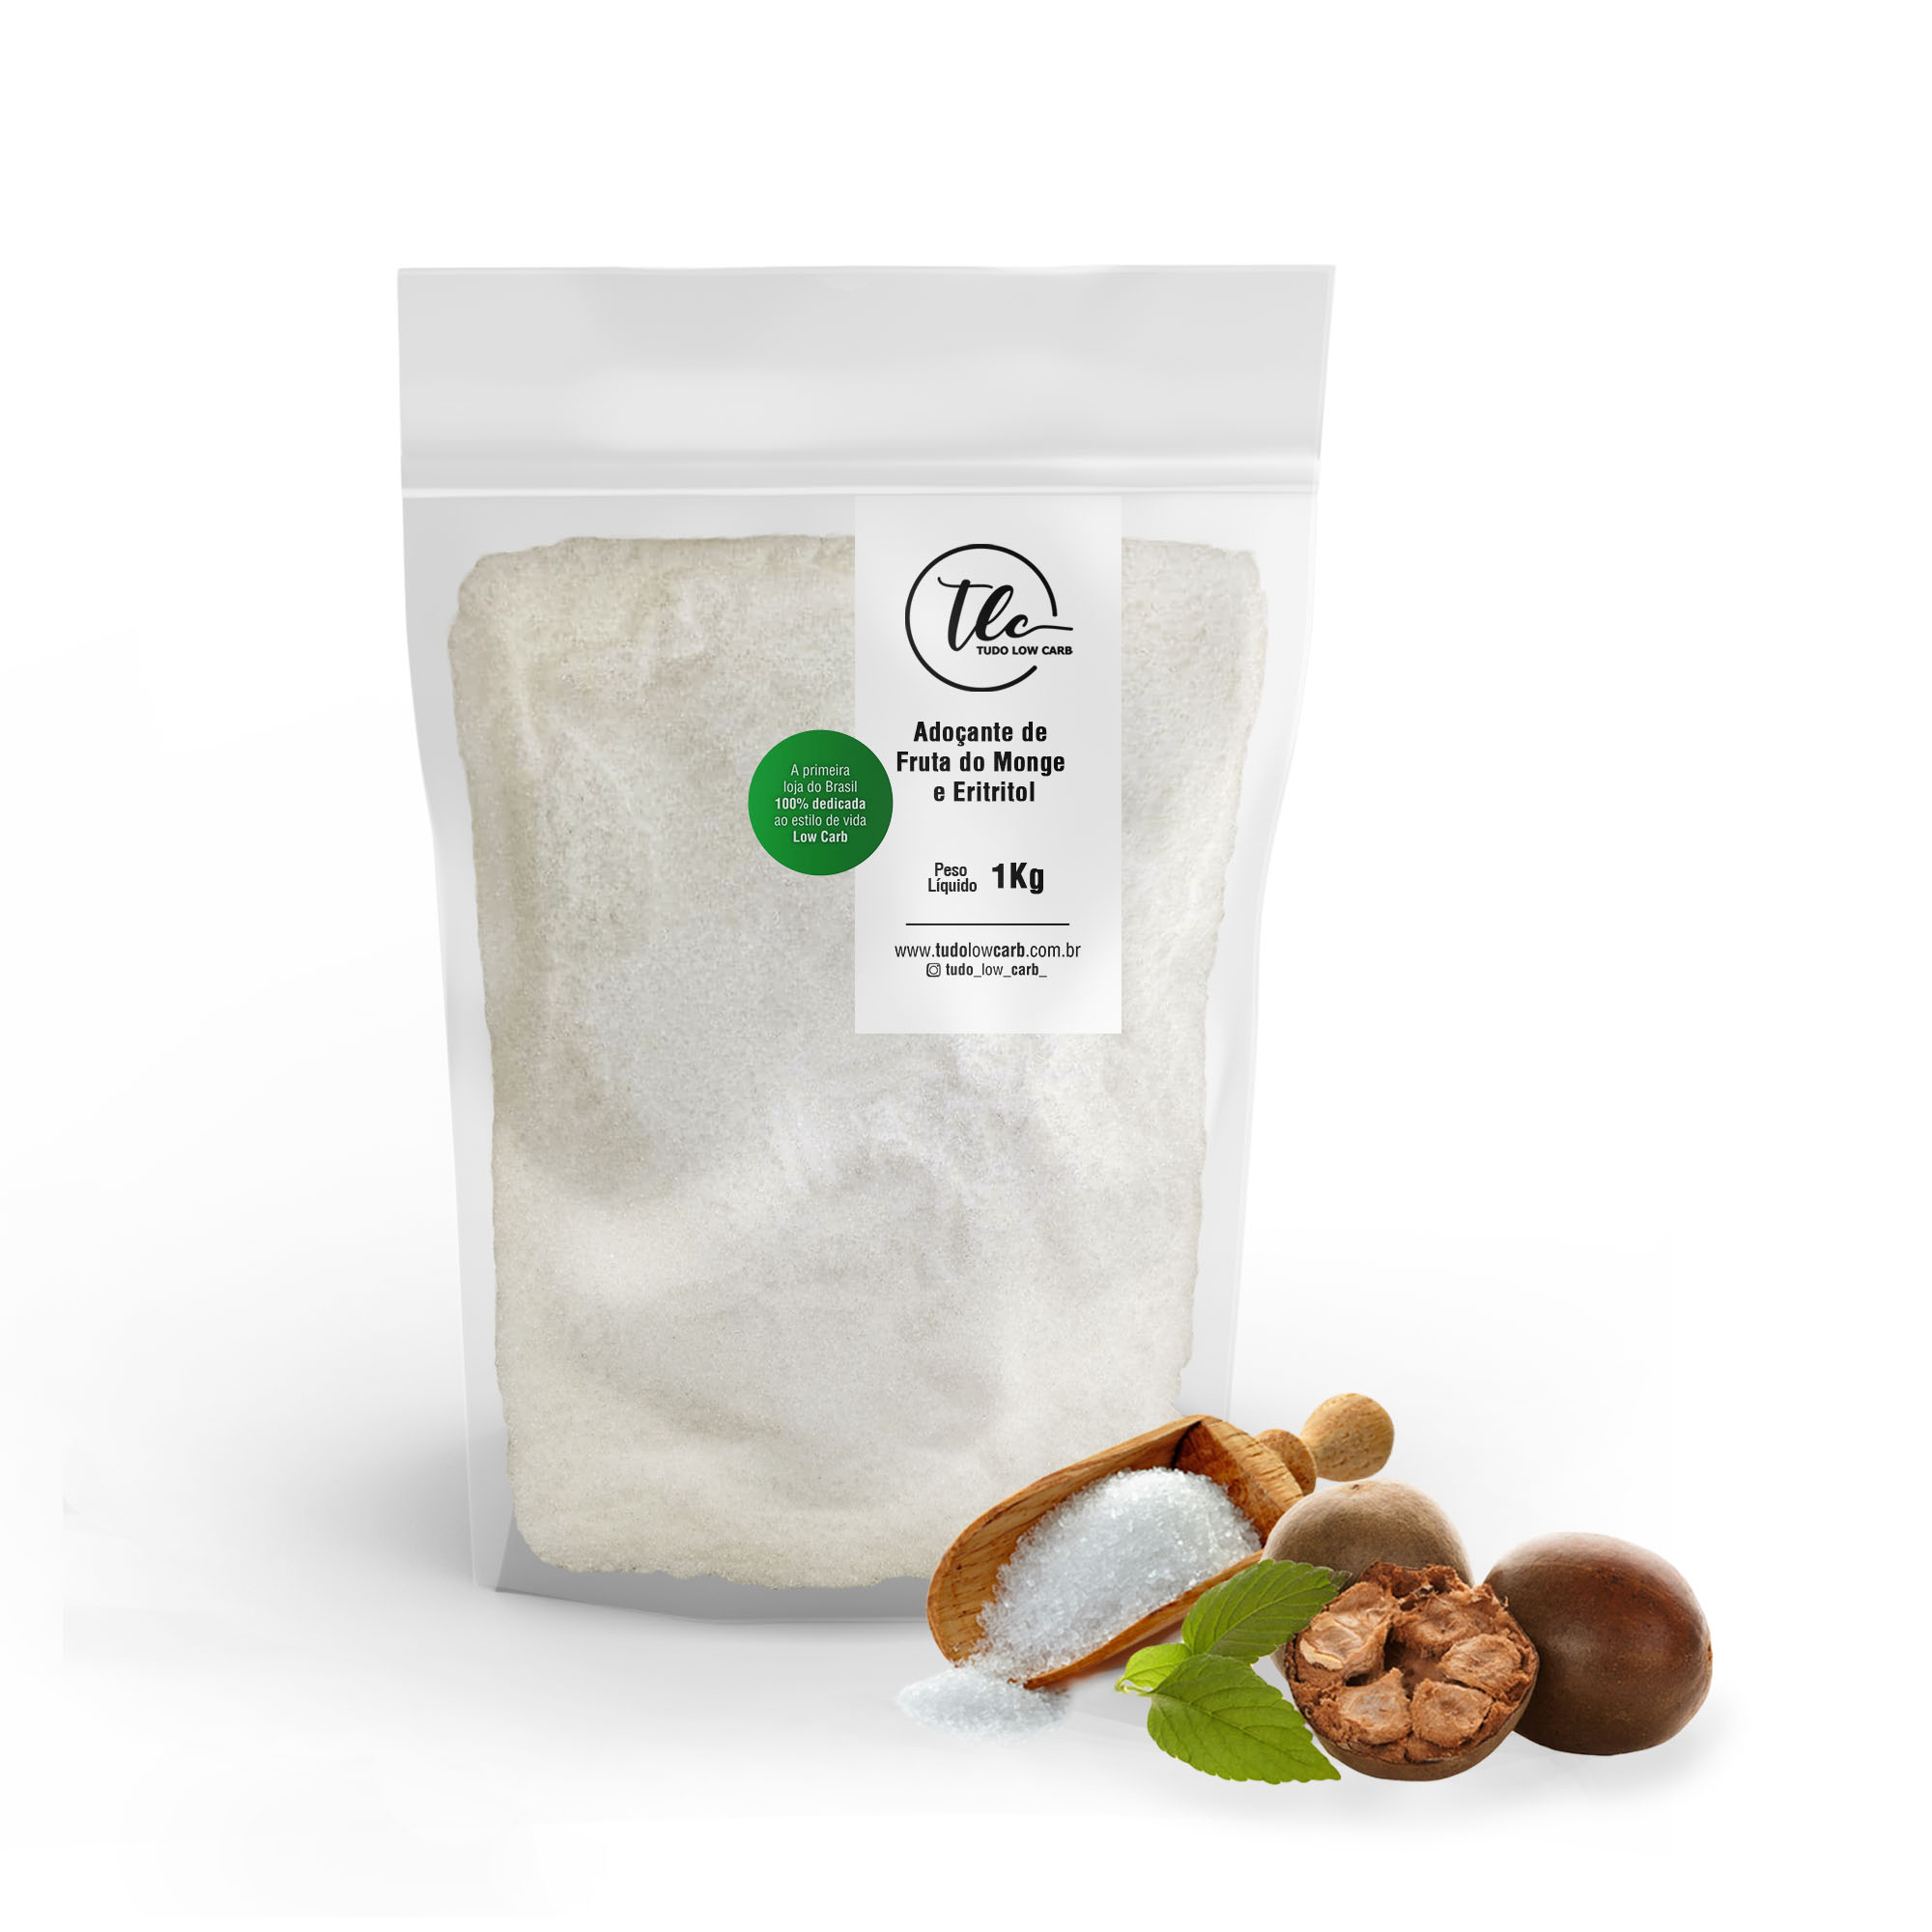 Adoçante de Fruta do Monge e Eritritol (Monk Fruit + Erythritol) 1 kg  - TLC Tudo Low Carb